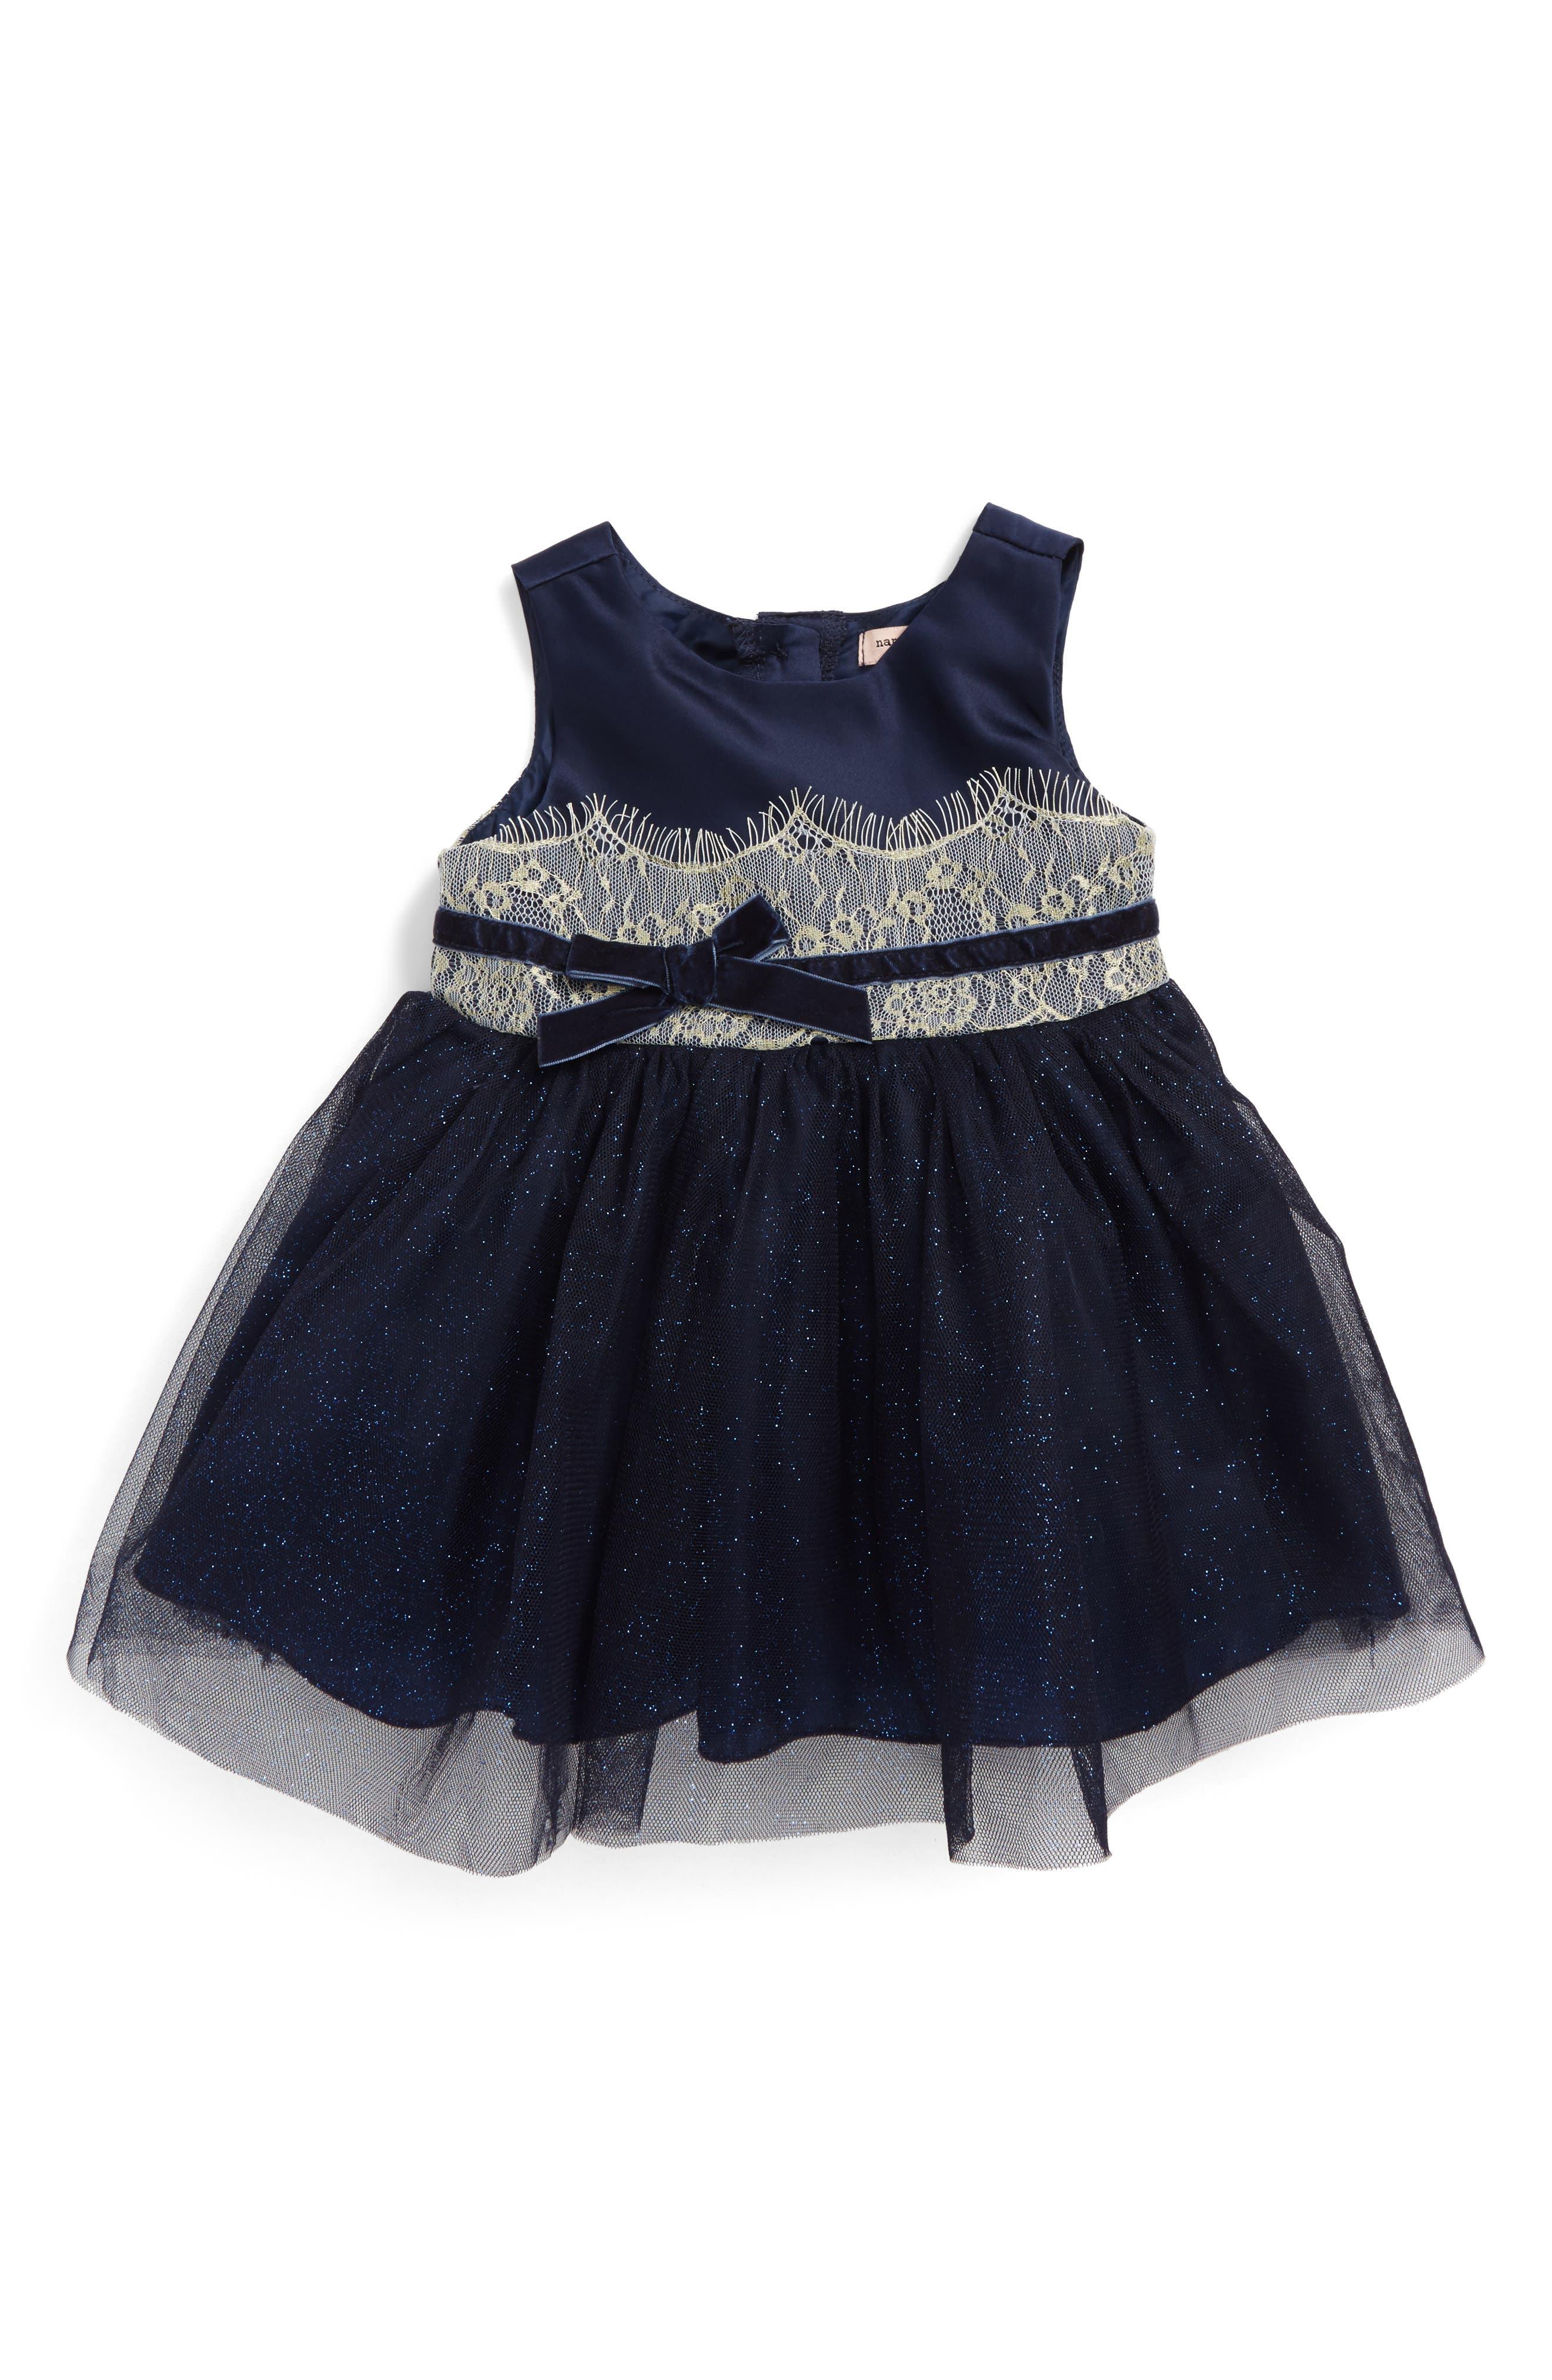 Main Image - Nanette Lepore Shimmer Lace & Tulle Dress (Baby Girls)